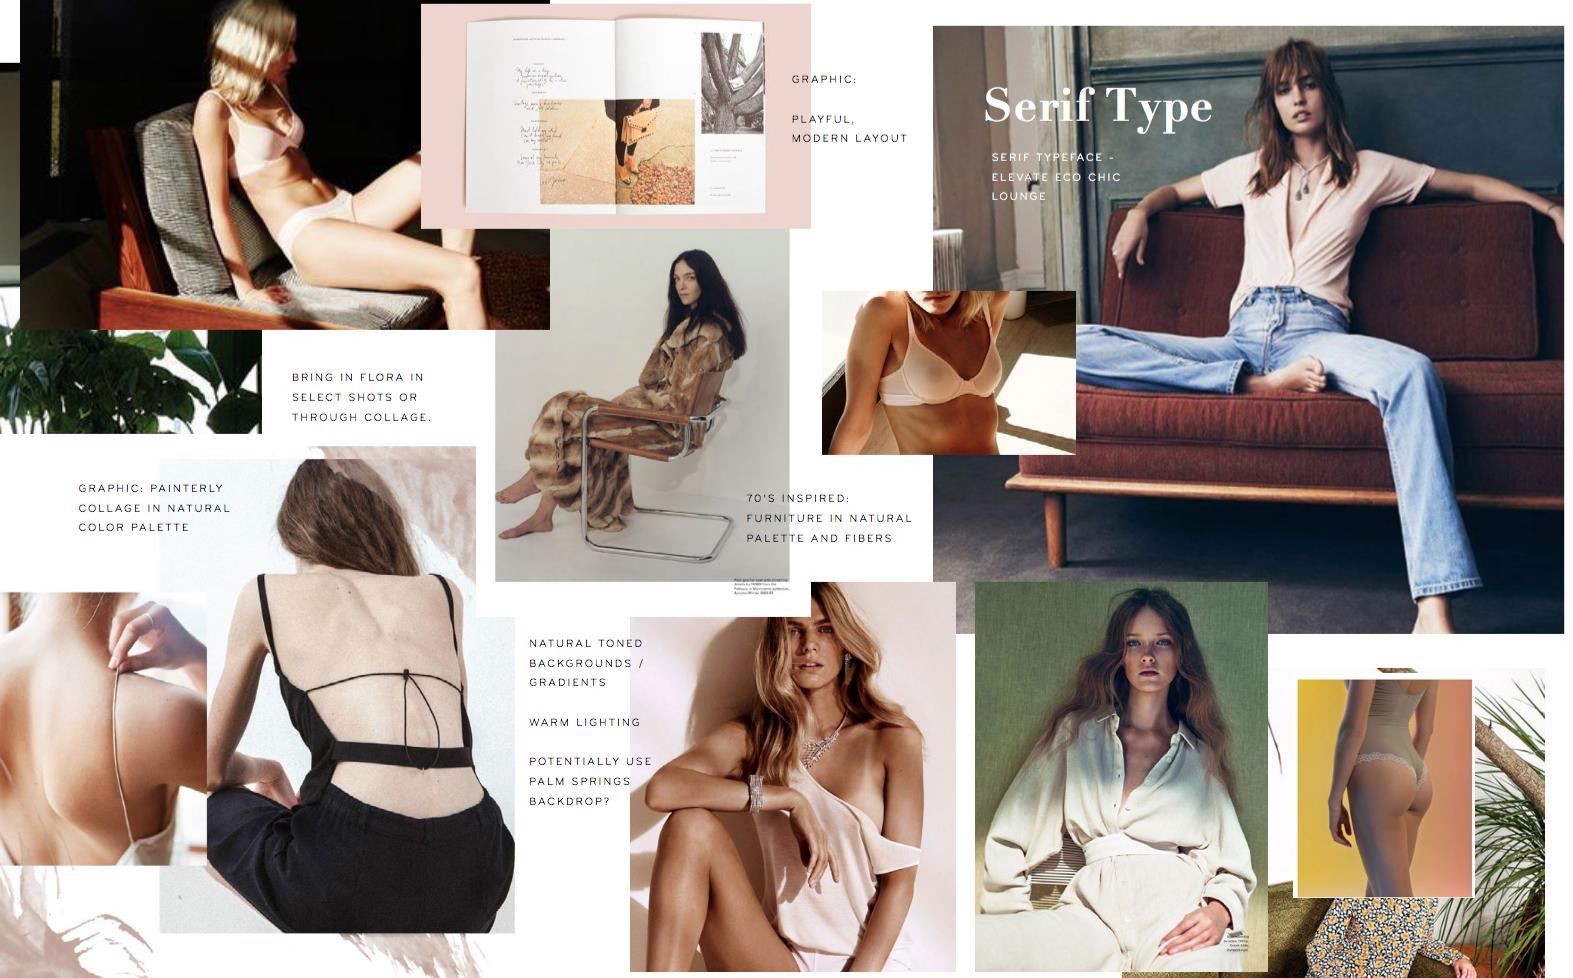 True&Co. SS'16 - E-commerce fashion catalog shoot moodboard by Do-Hee Kim - www.do-hee.com